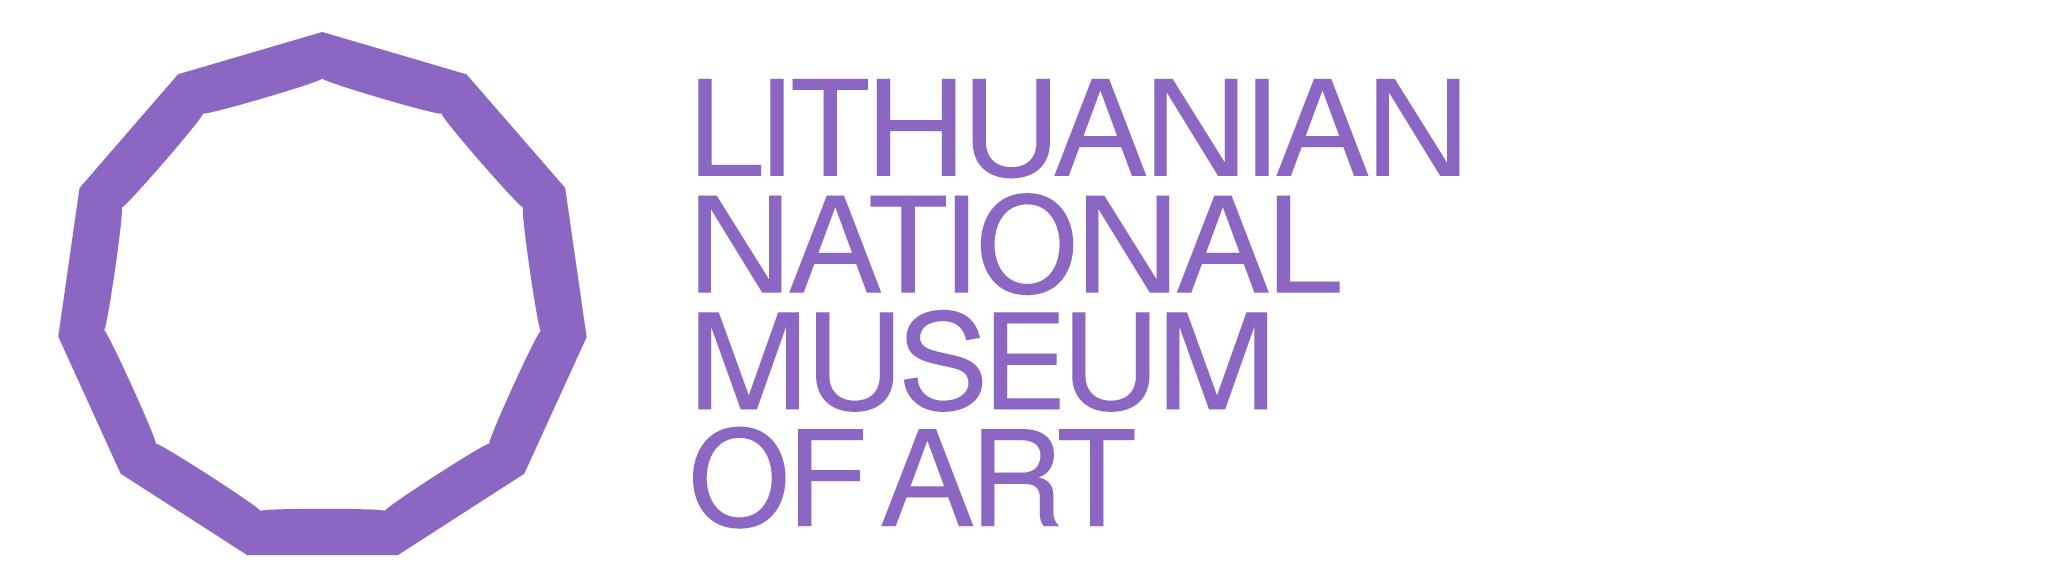 Lithuanian National Museum of Art